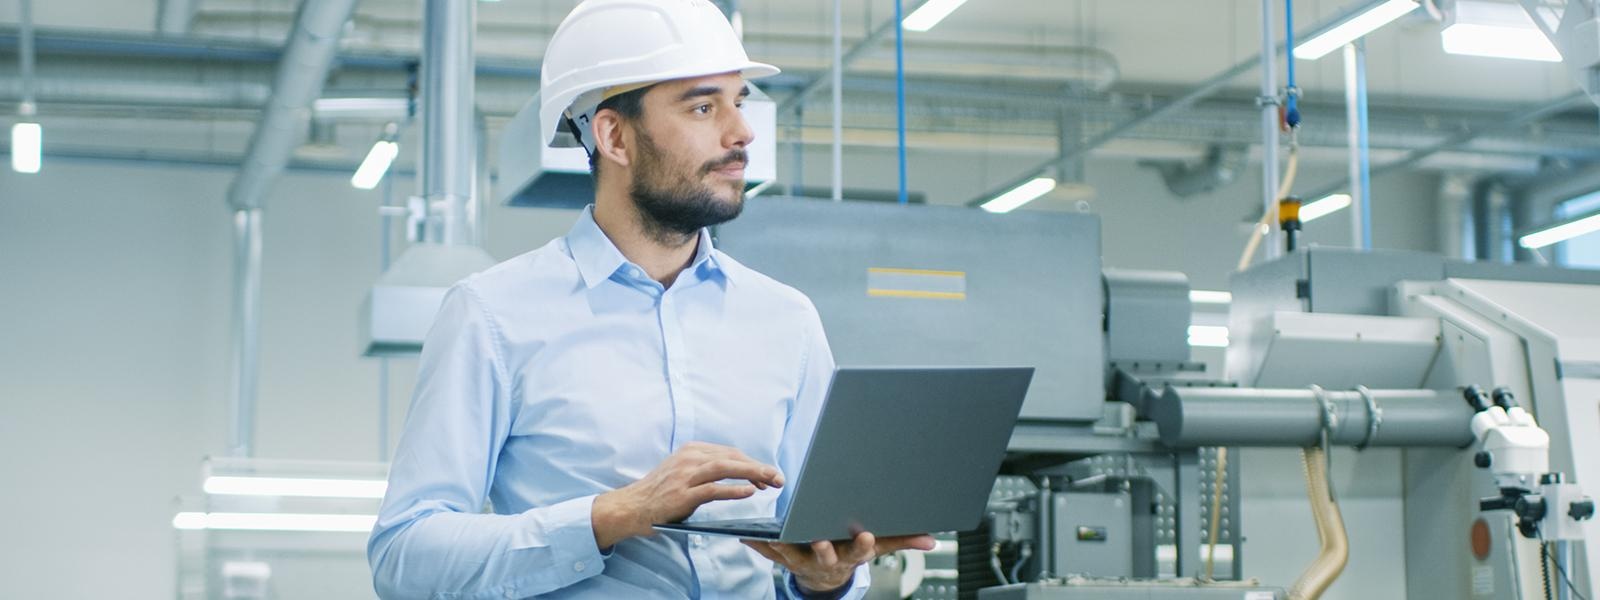 operations staff checking customer equipment runs smoothly